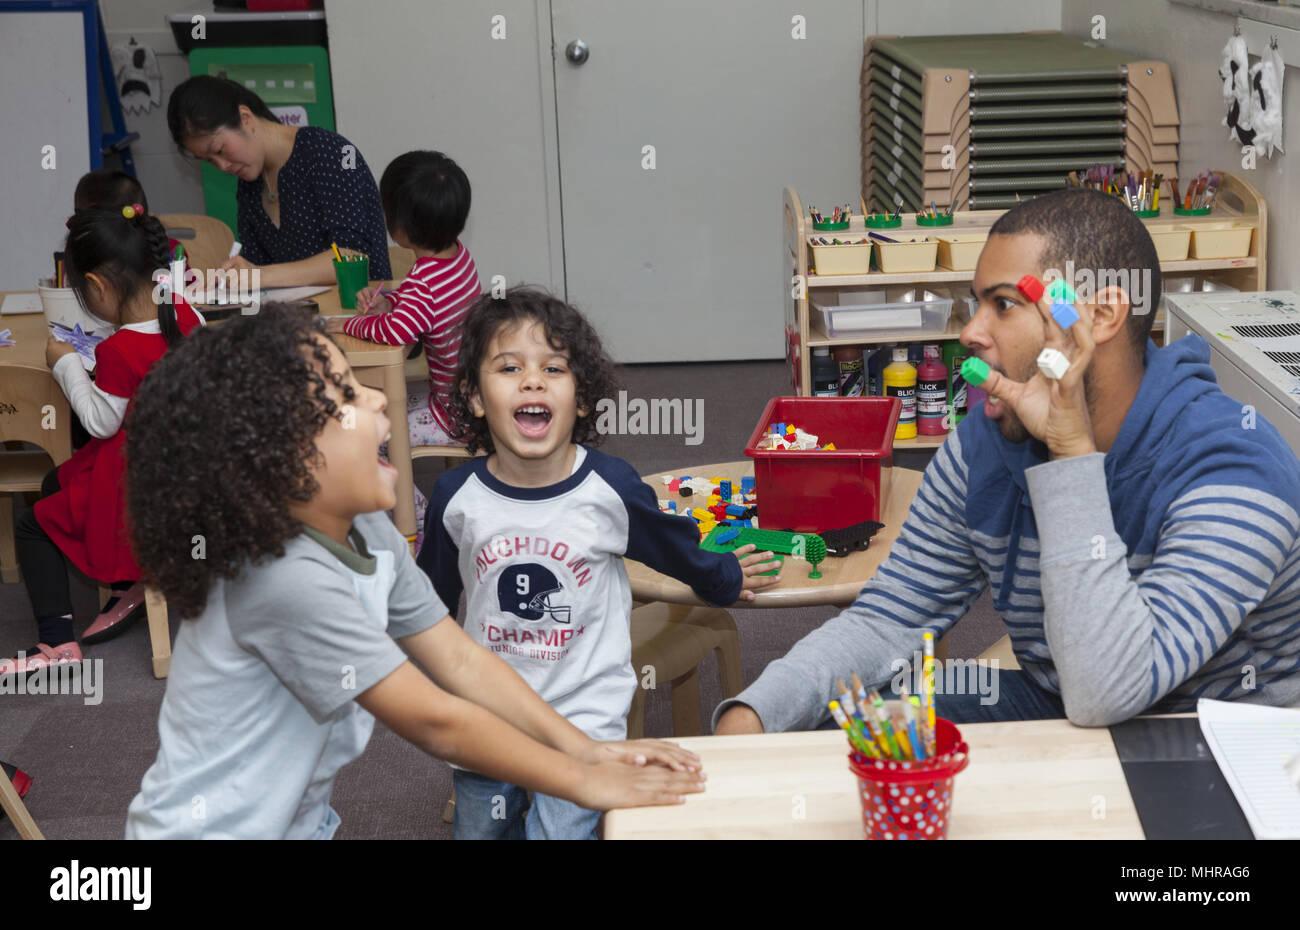 Preschool on the Lower East Side, Manhattan, New York City. - Stock Image